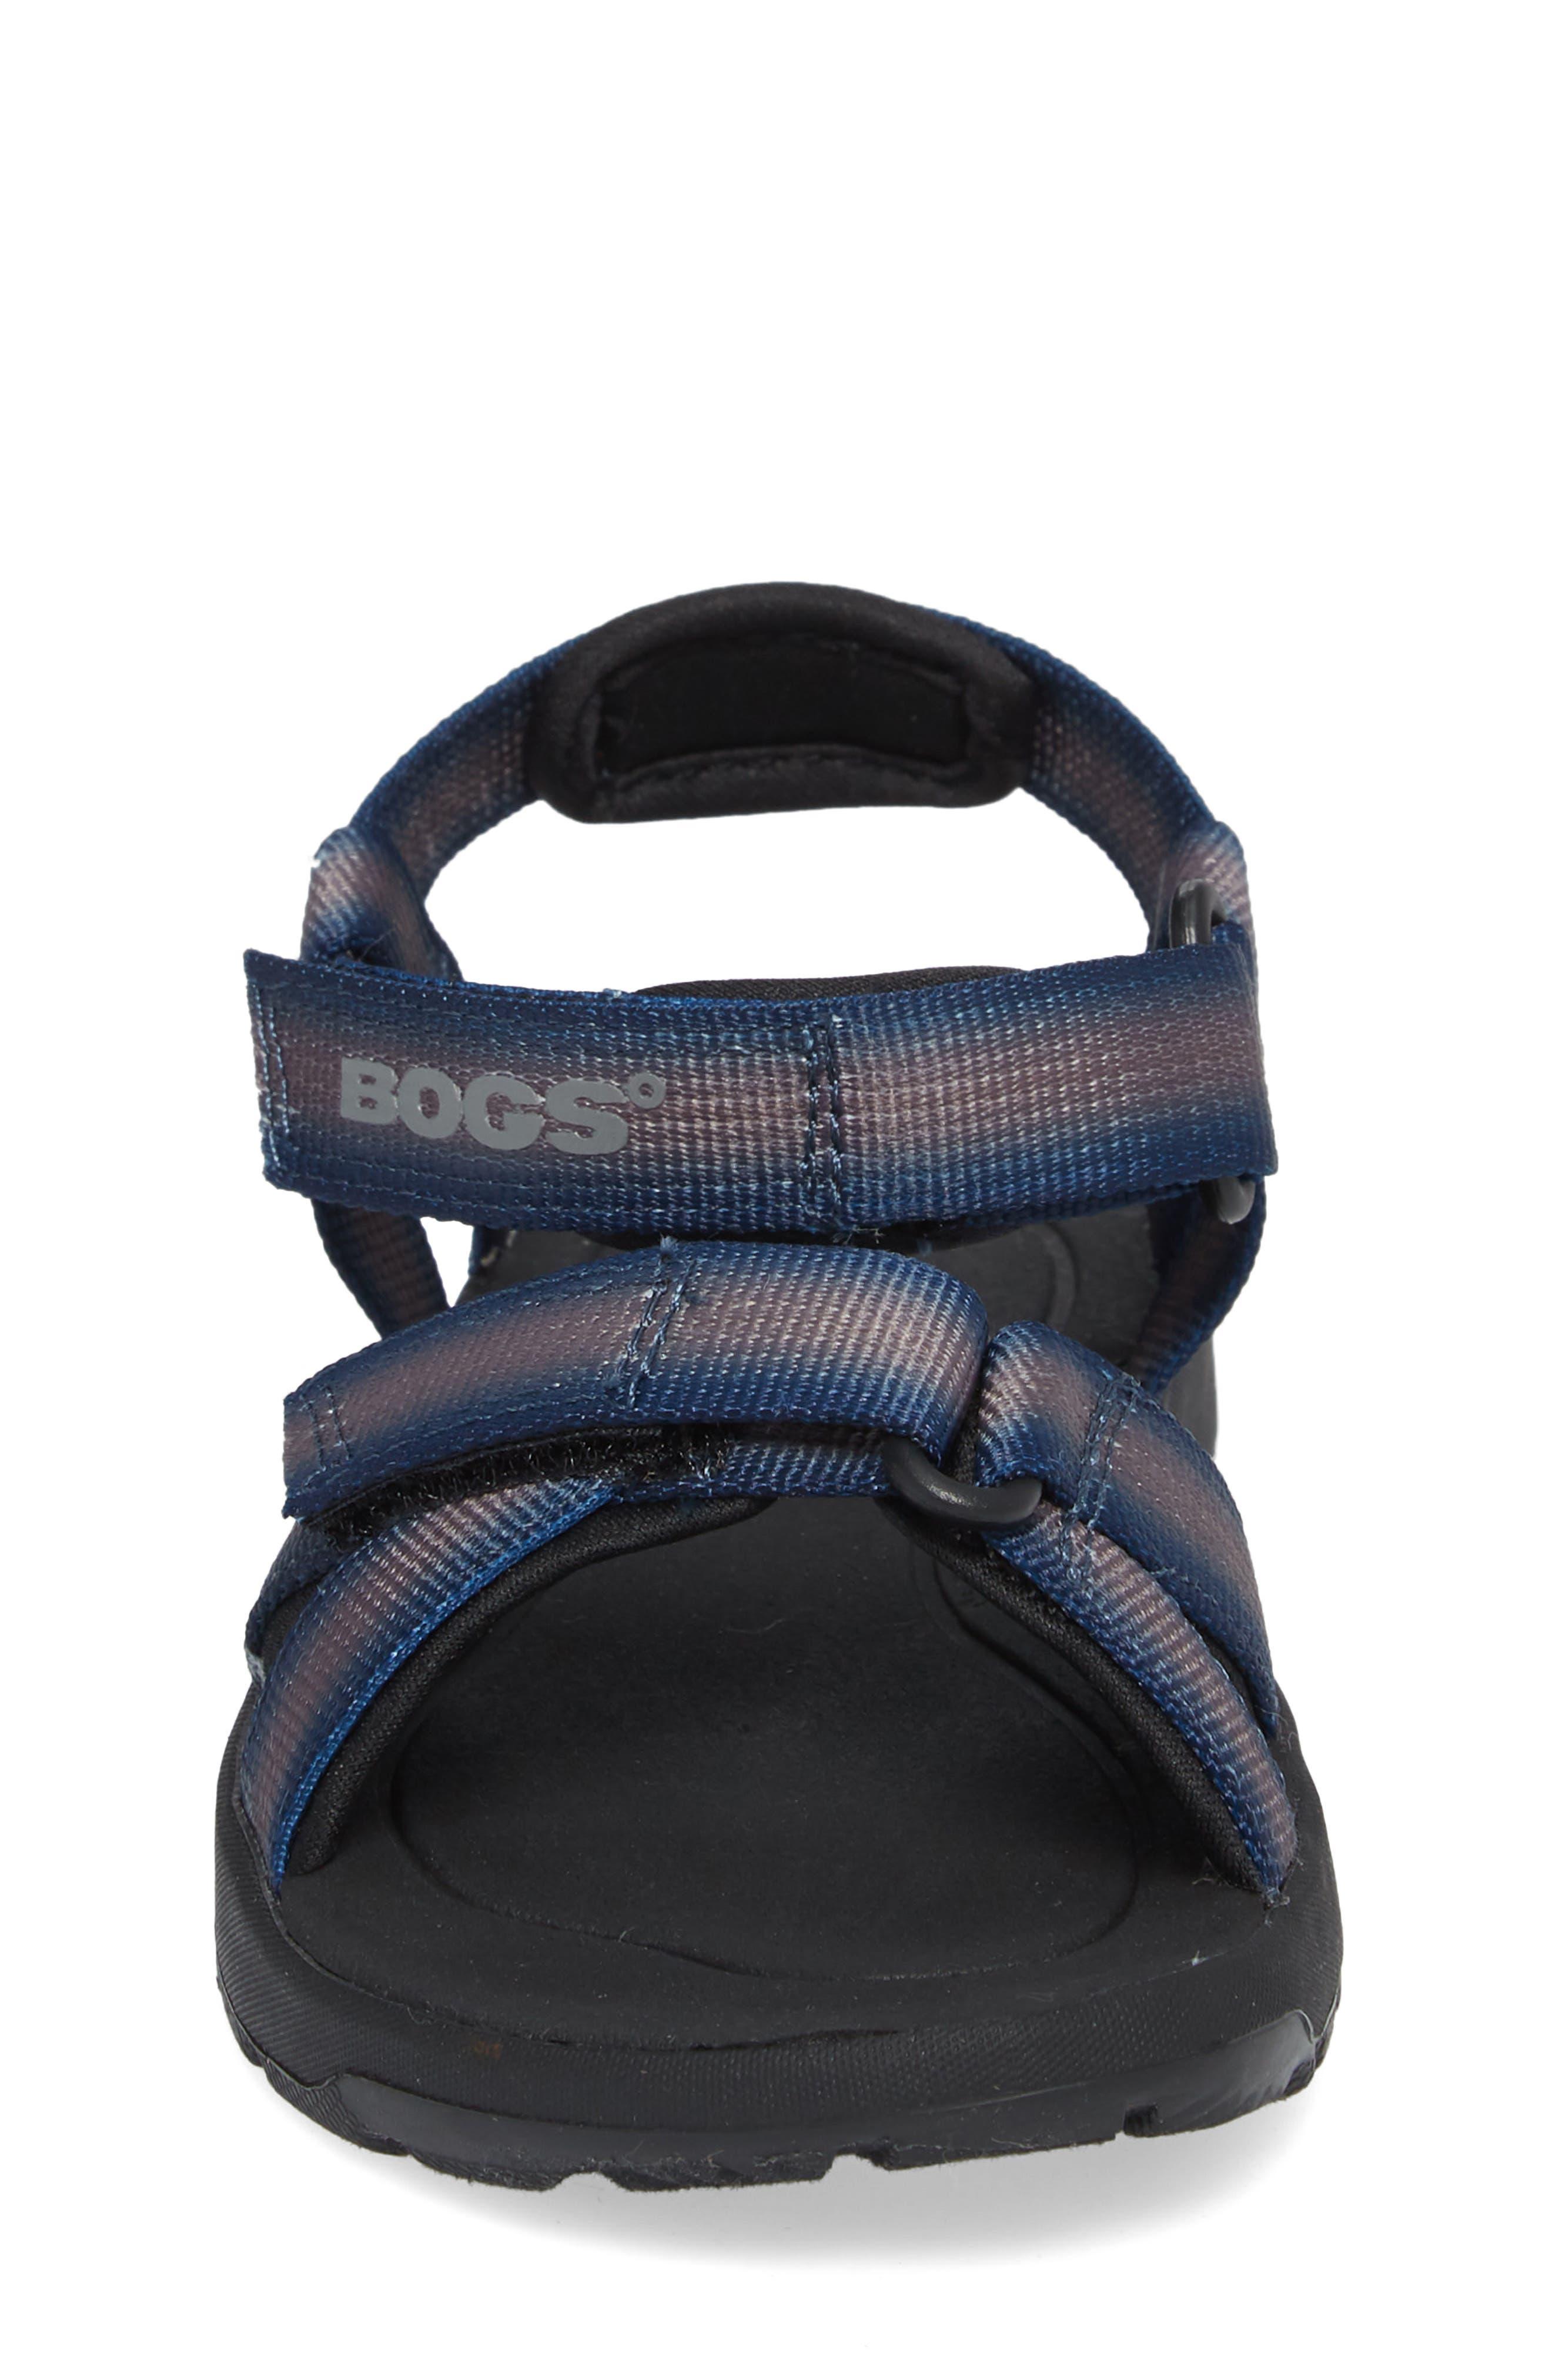 BOGS, Rio Sunrise Stripe Sandal, Alternate thumbnail 4, color, 062